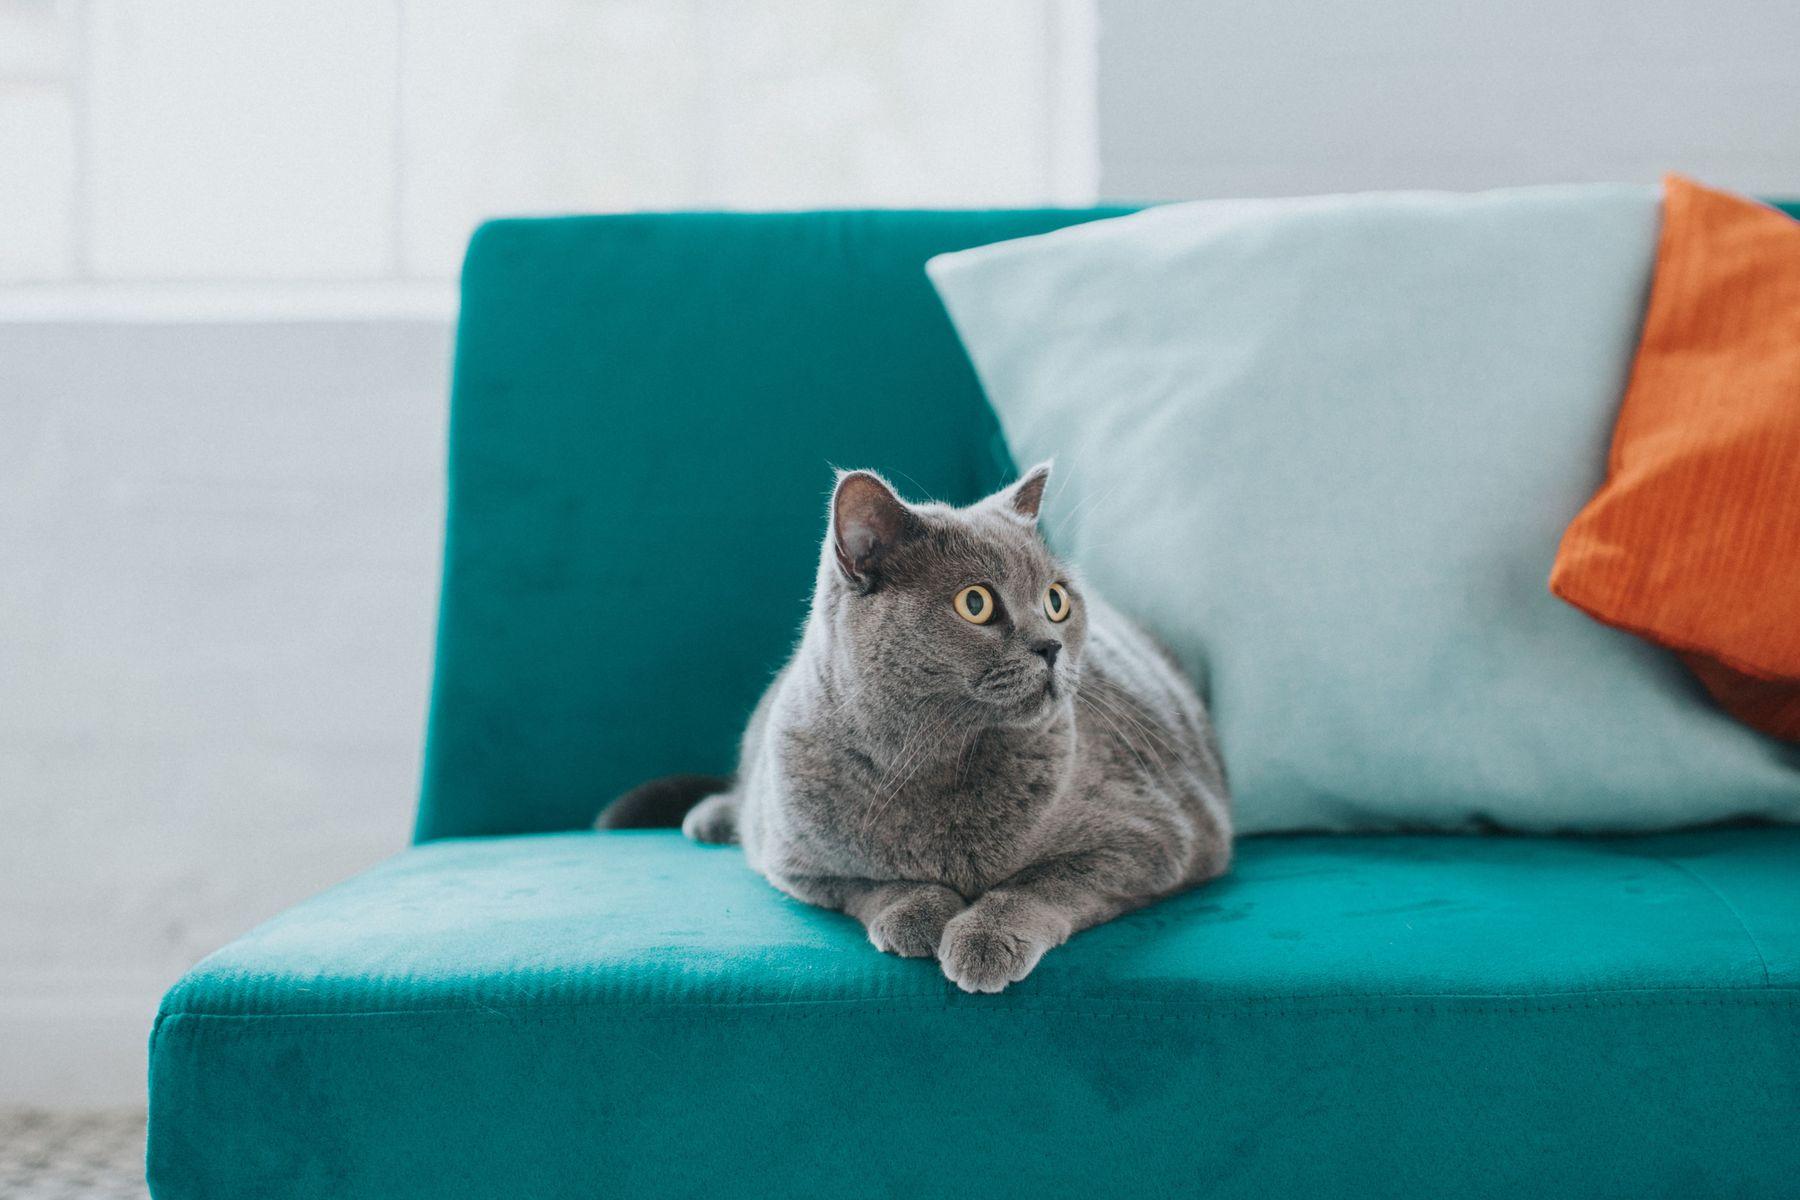 a grey cat sat on a blue sofa